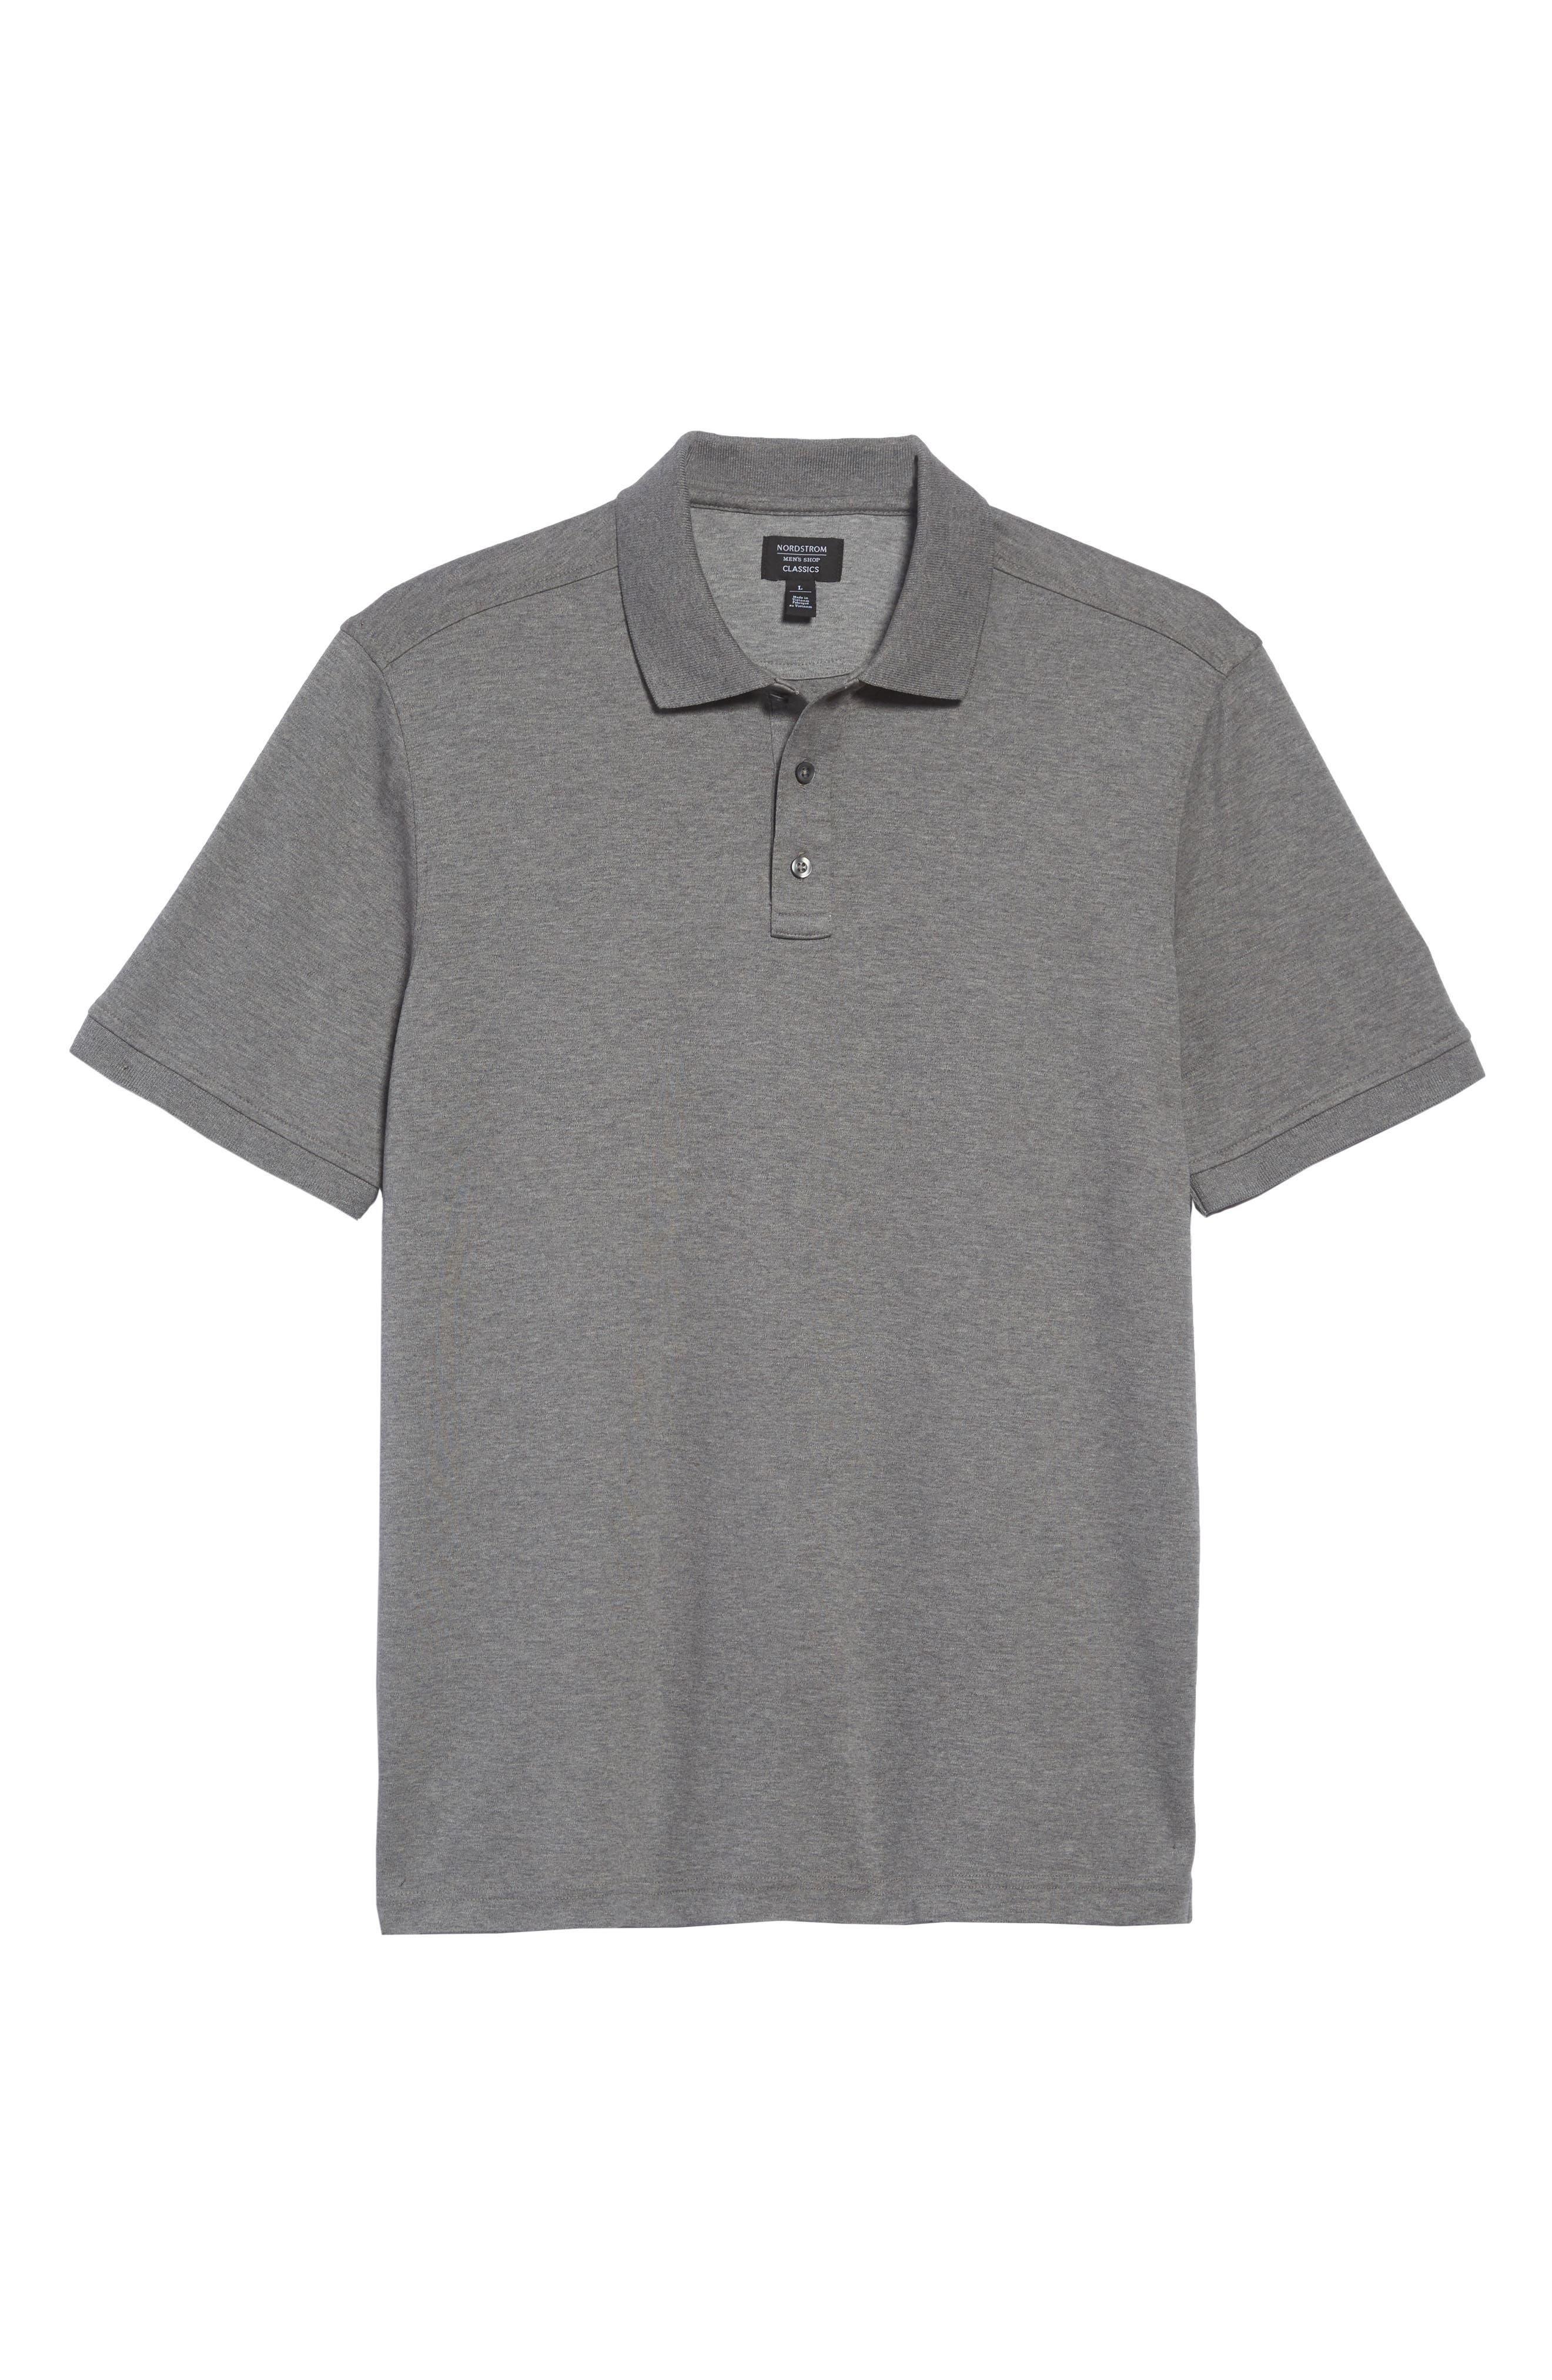 b11d96457c239 Men s Polo Shirts